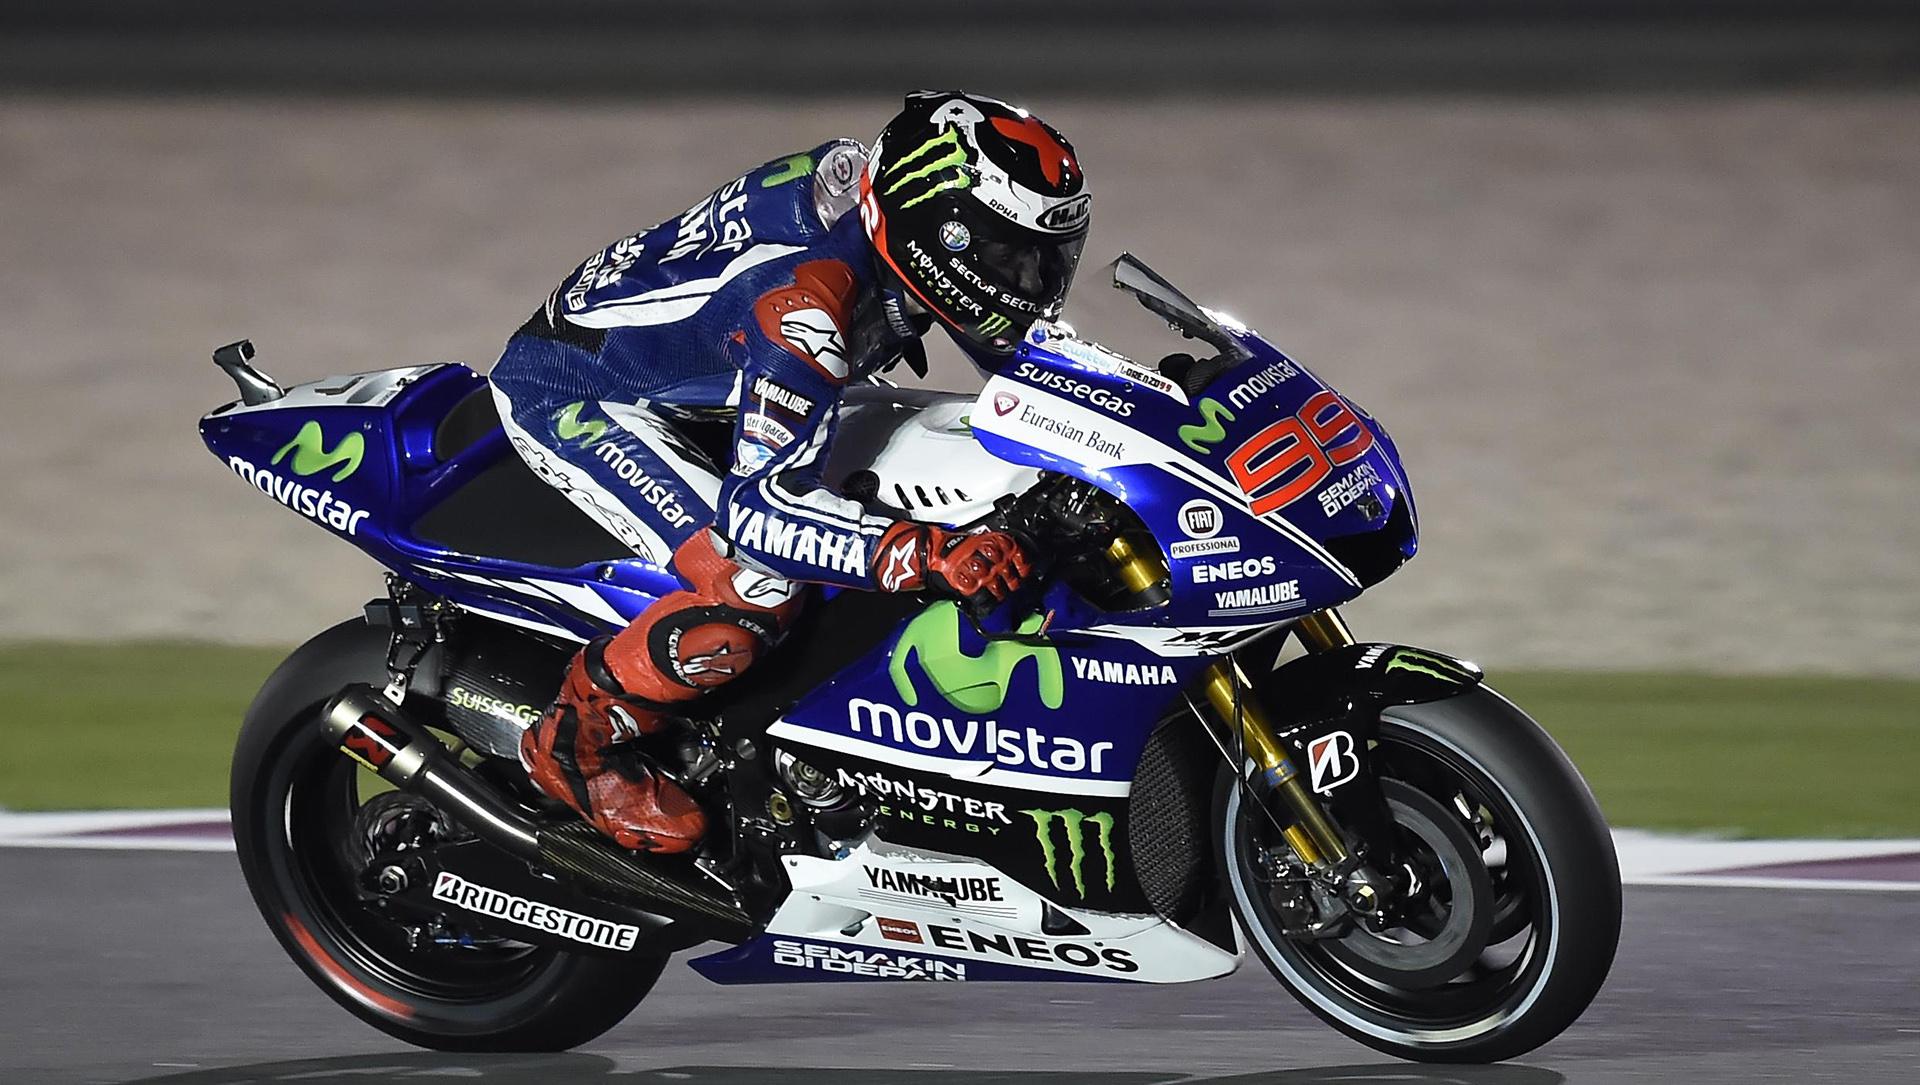 Jorge Lorenzo Movistar Yamaha 2014 MotoGP   Wide Screen Wallpaper 1080p,2K,4K